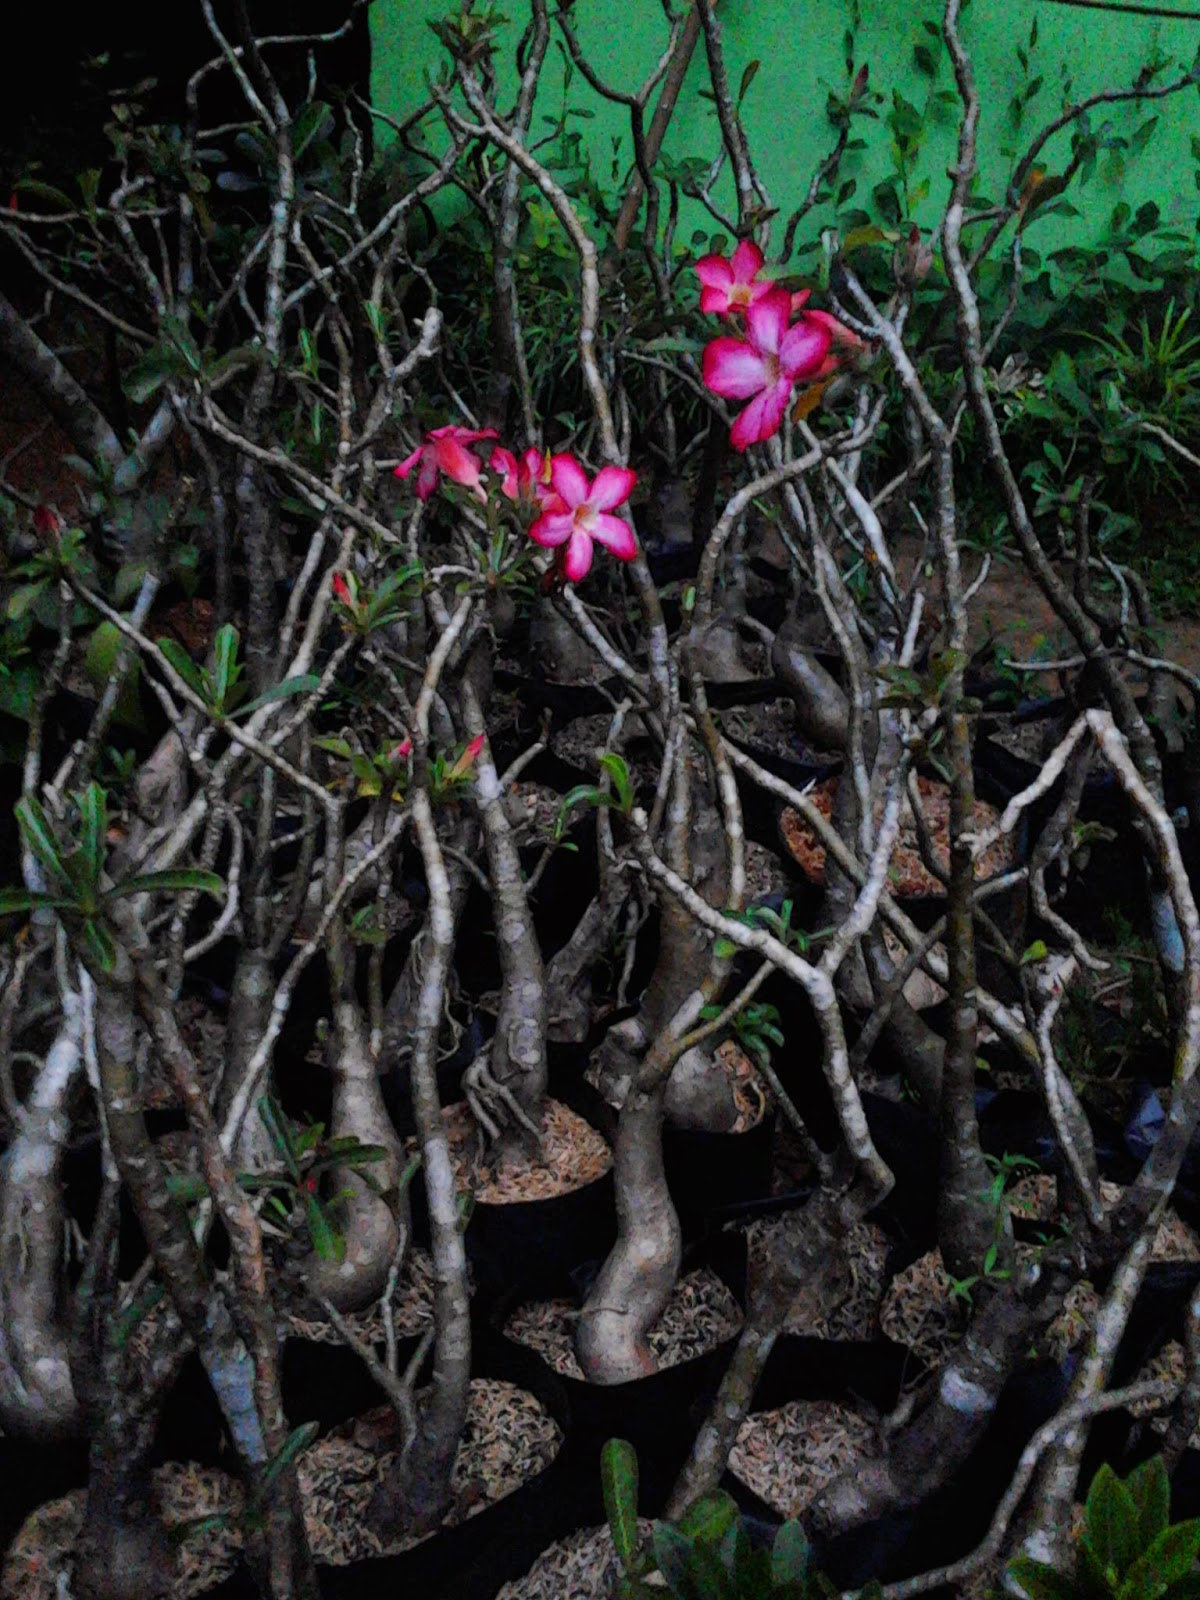 Jual adenium Poseidon | adenium obesum | bunga putih | bunga merah fanta